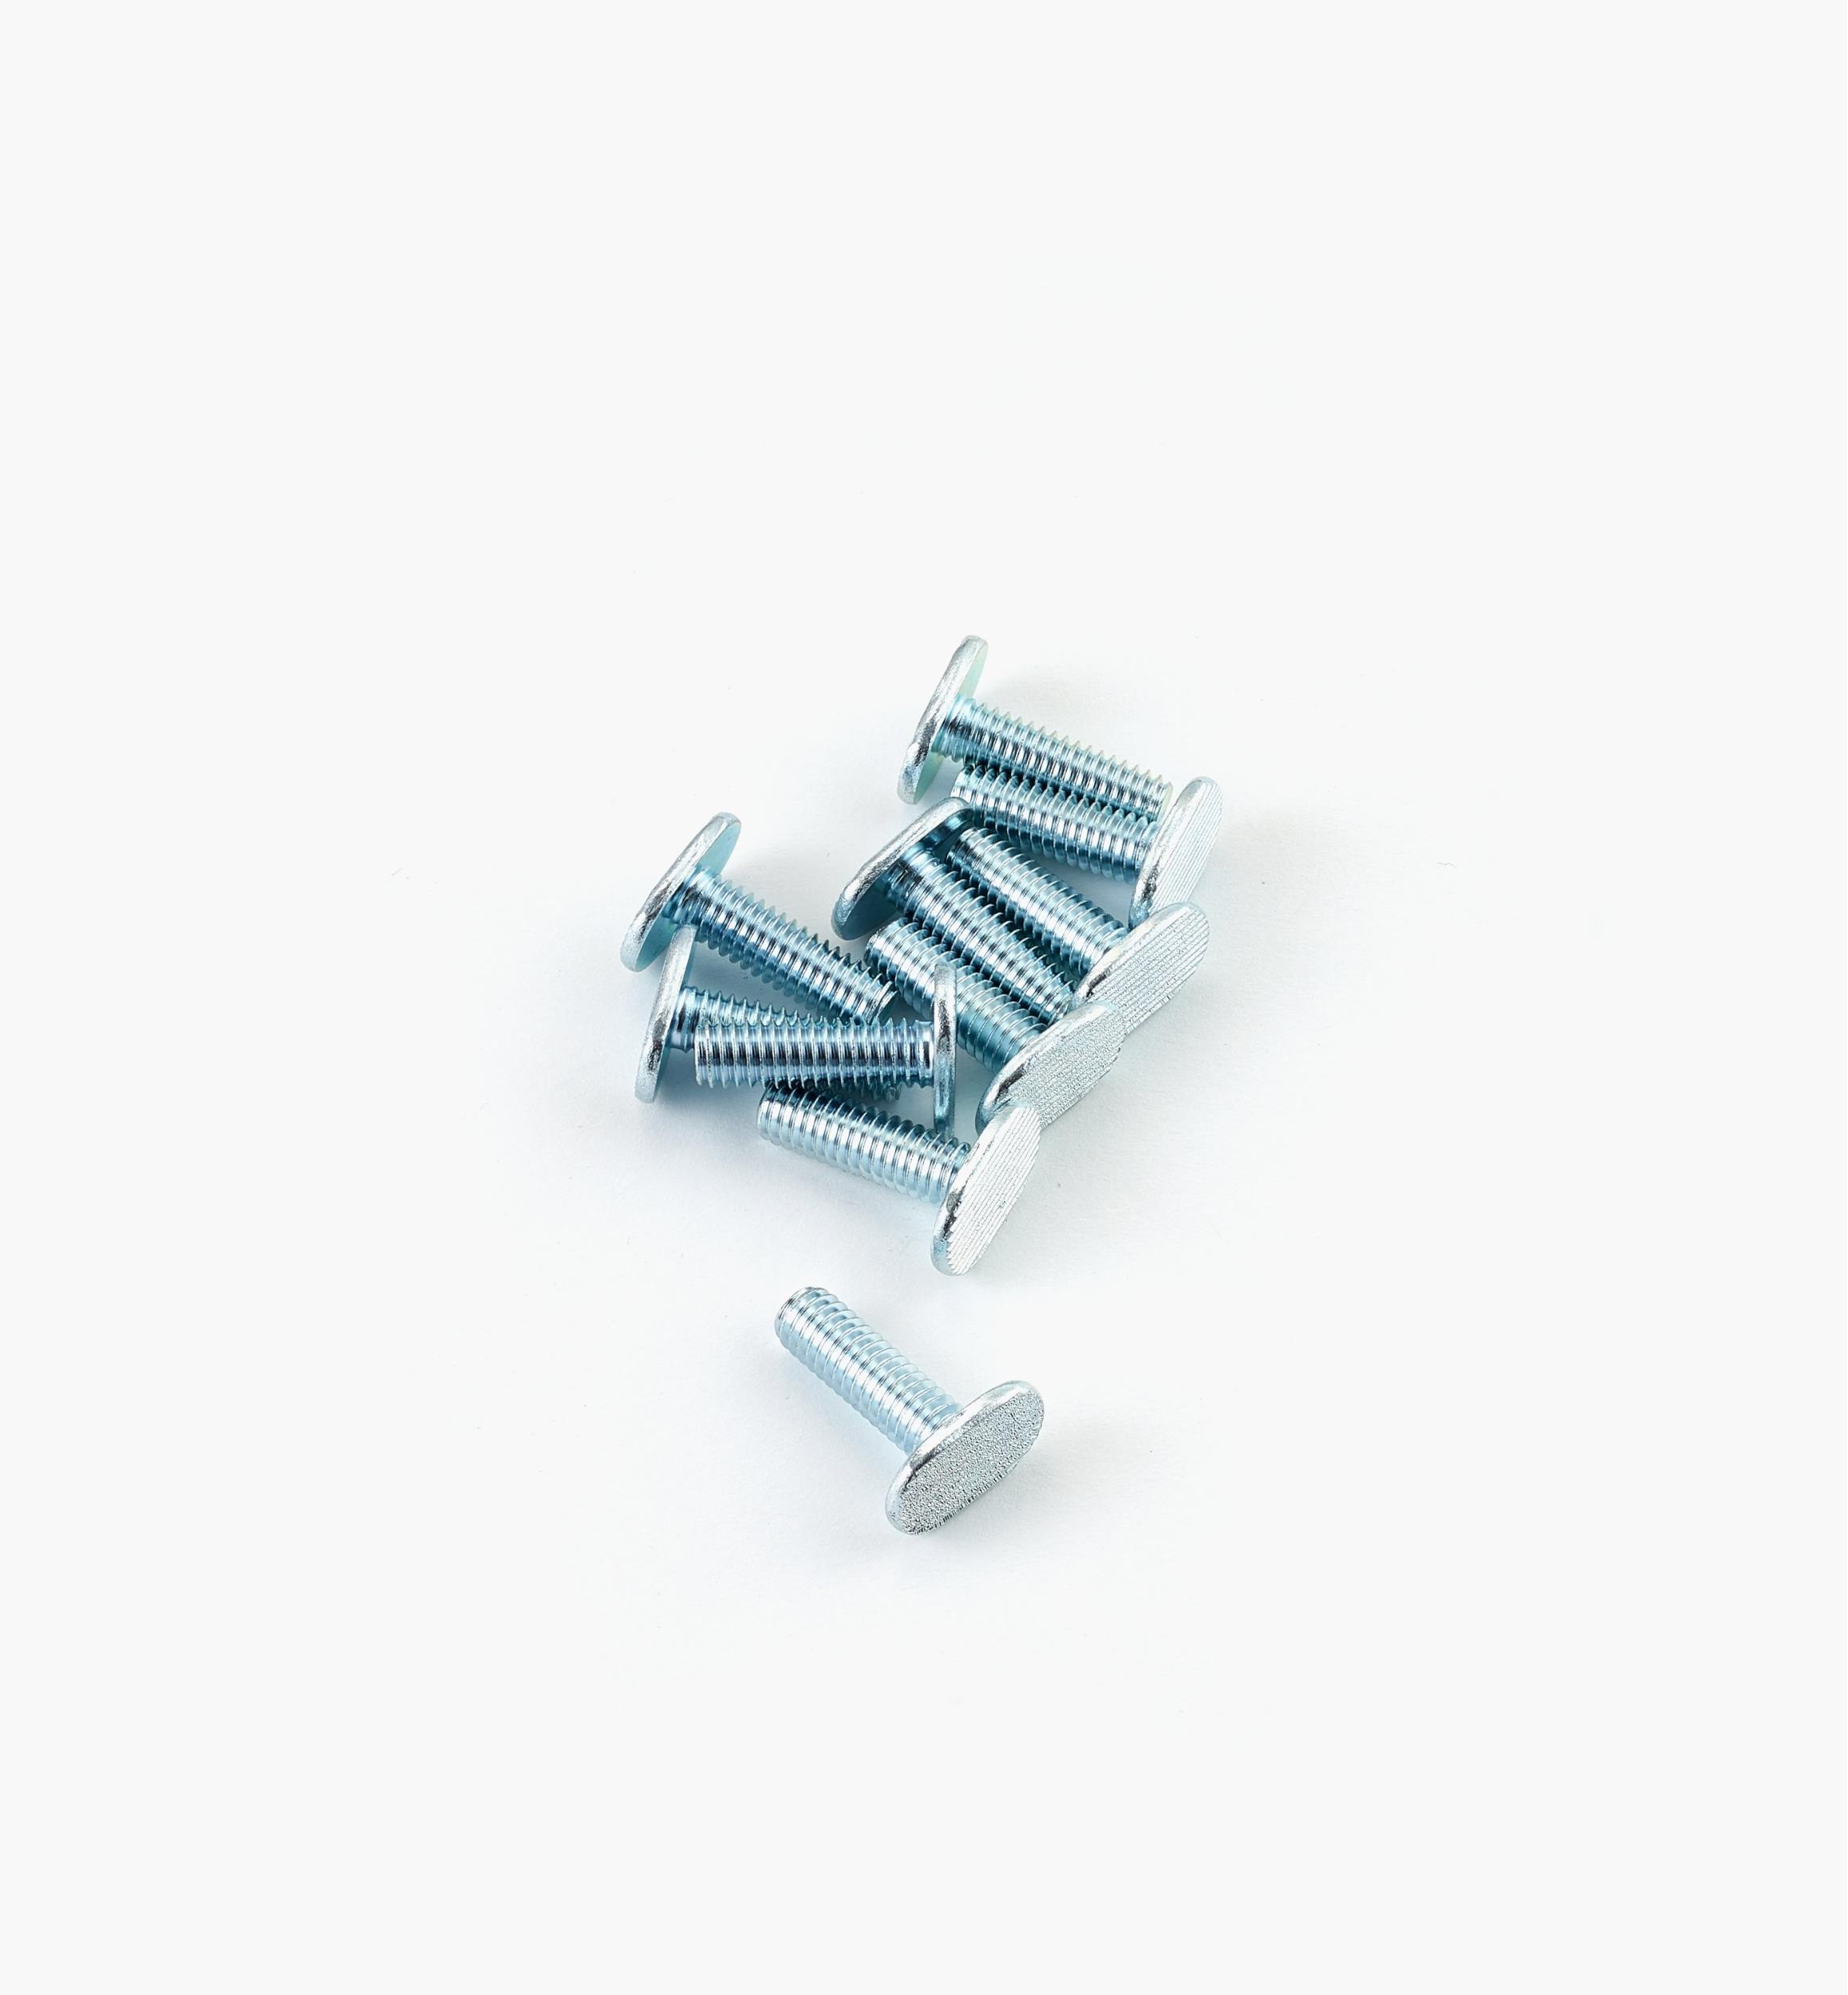 Pack of 12 5//16-18 X 5 Hanger Bolts